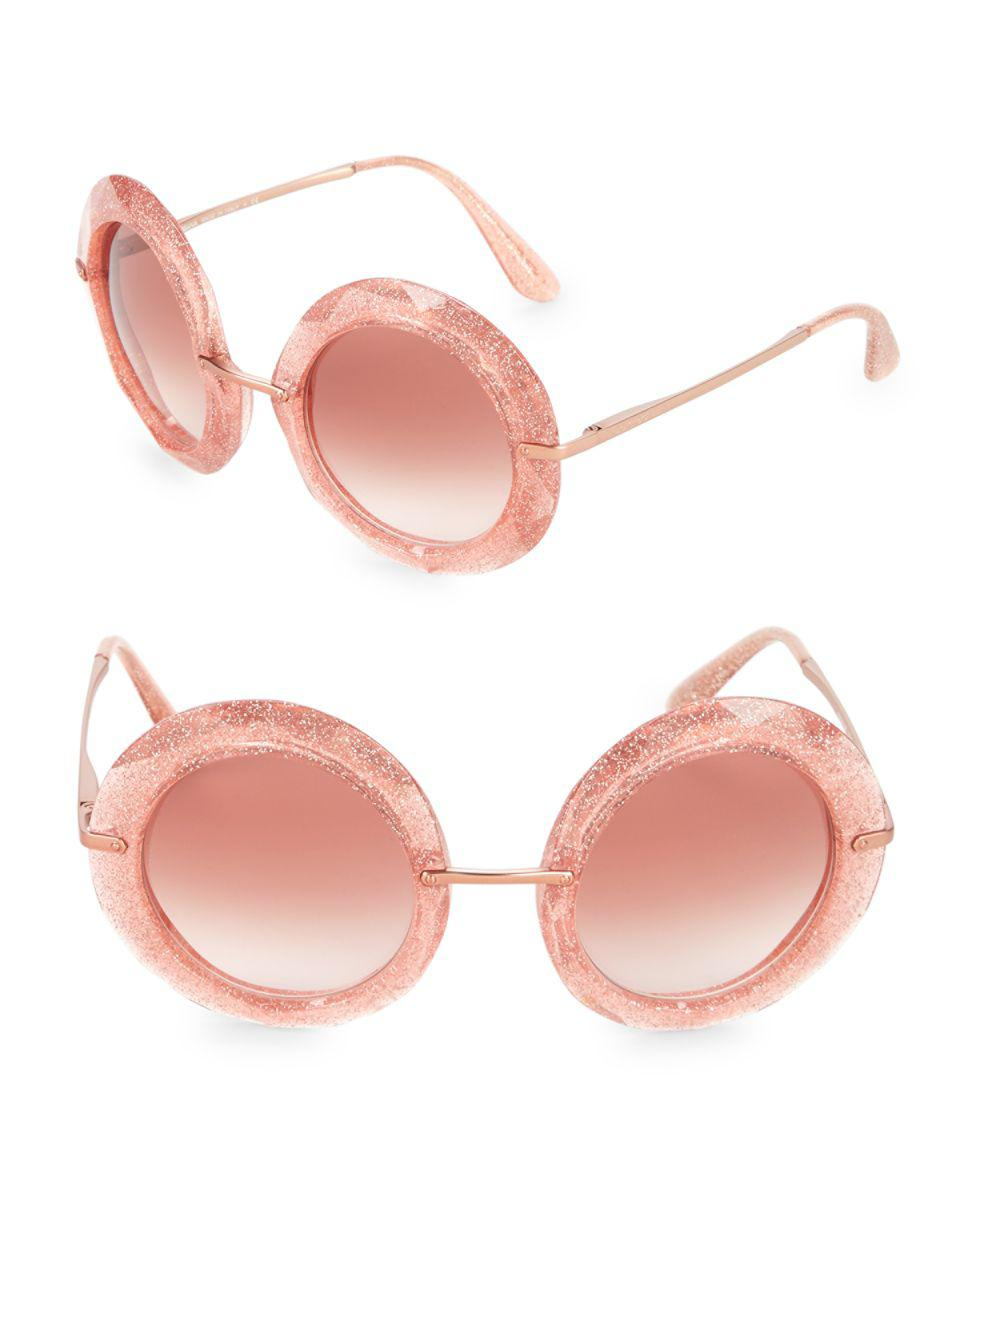 7604347a838 Lyst - Dolce   Gabbana 50mm Glittered Round Sunglasses in Pink